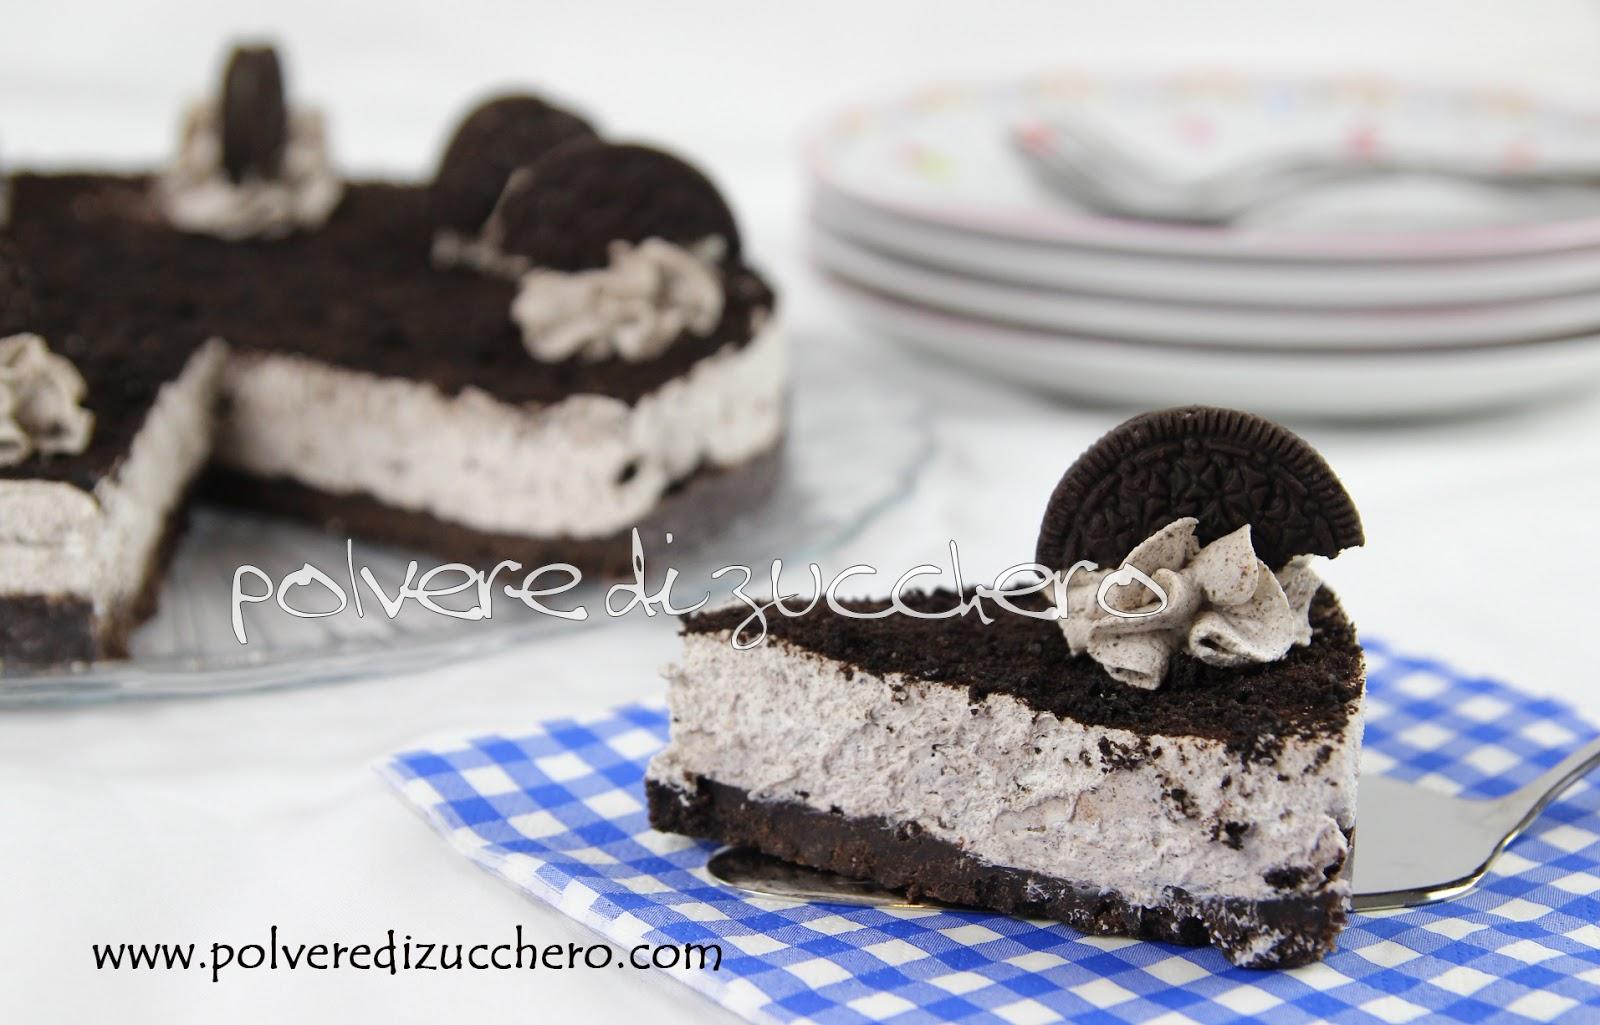 oreo cheesecake tutorial passo a passo polvere di zucchero torta